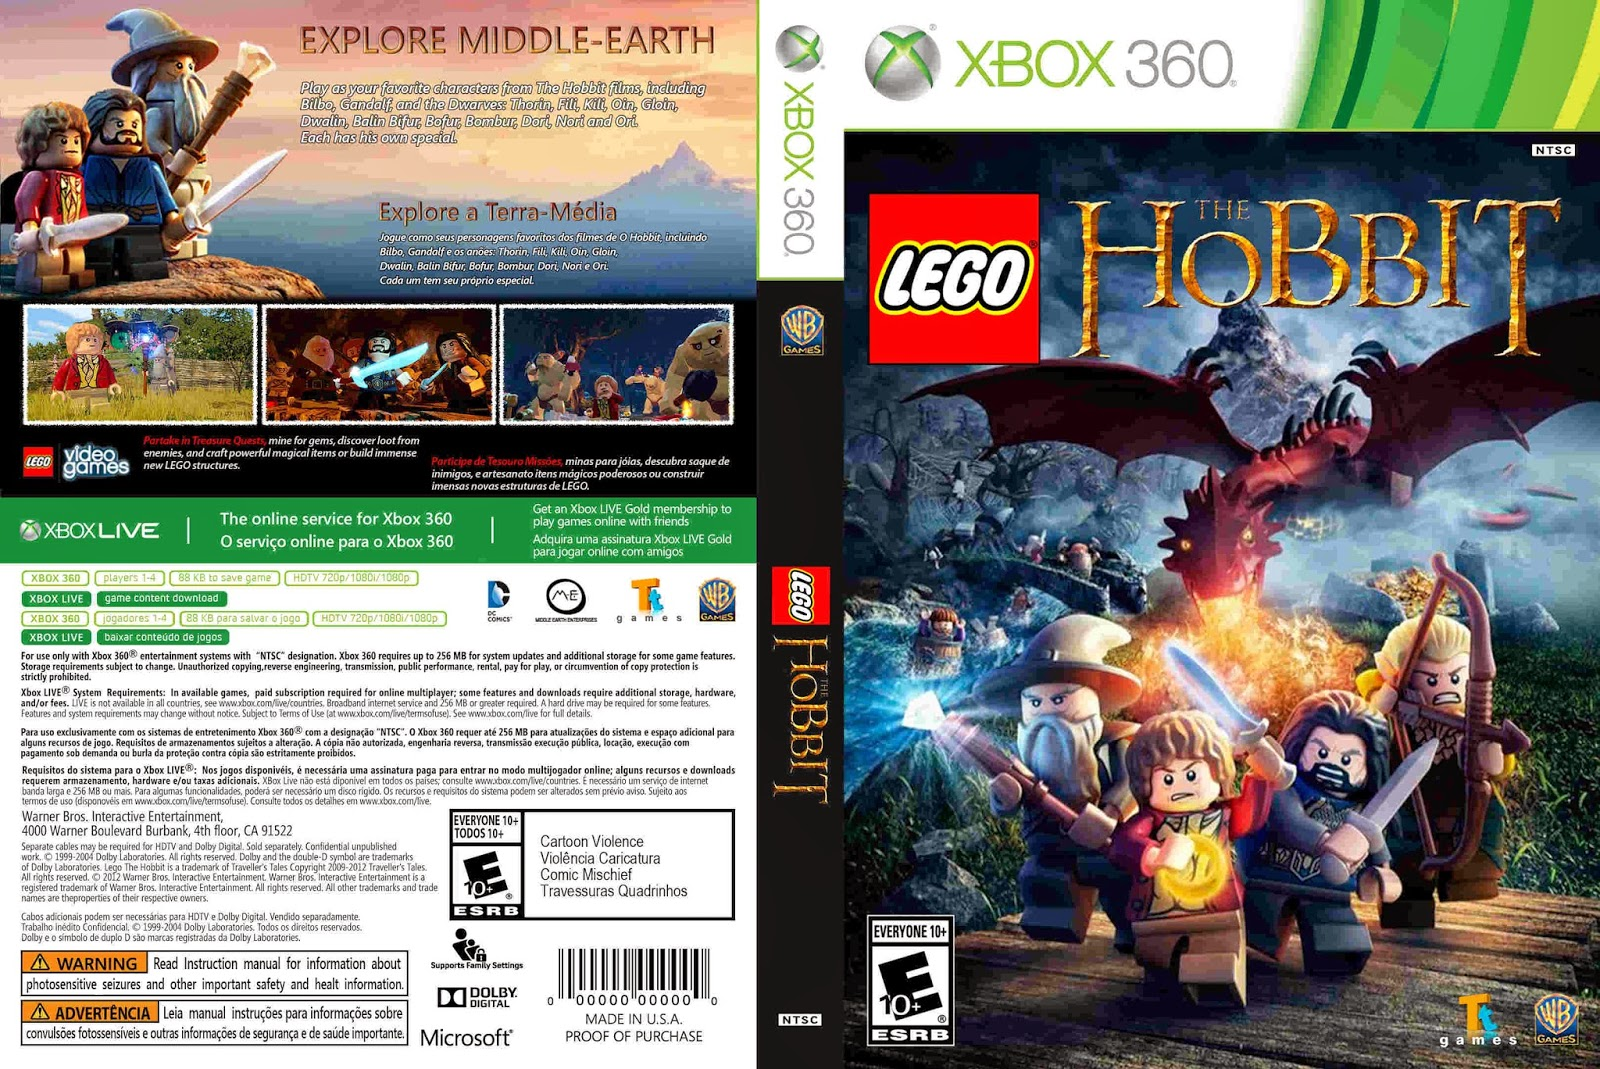 LEGO The Hobbit - Capa 02 Game e Label XBox 360